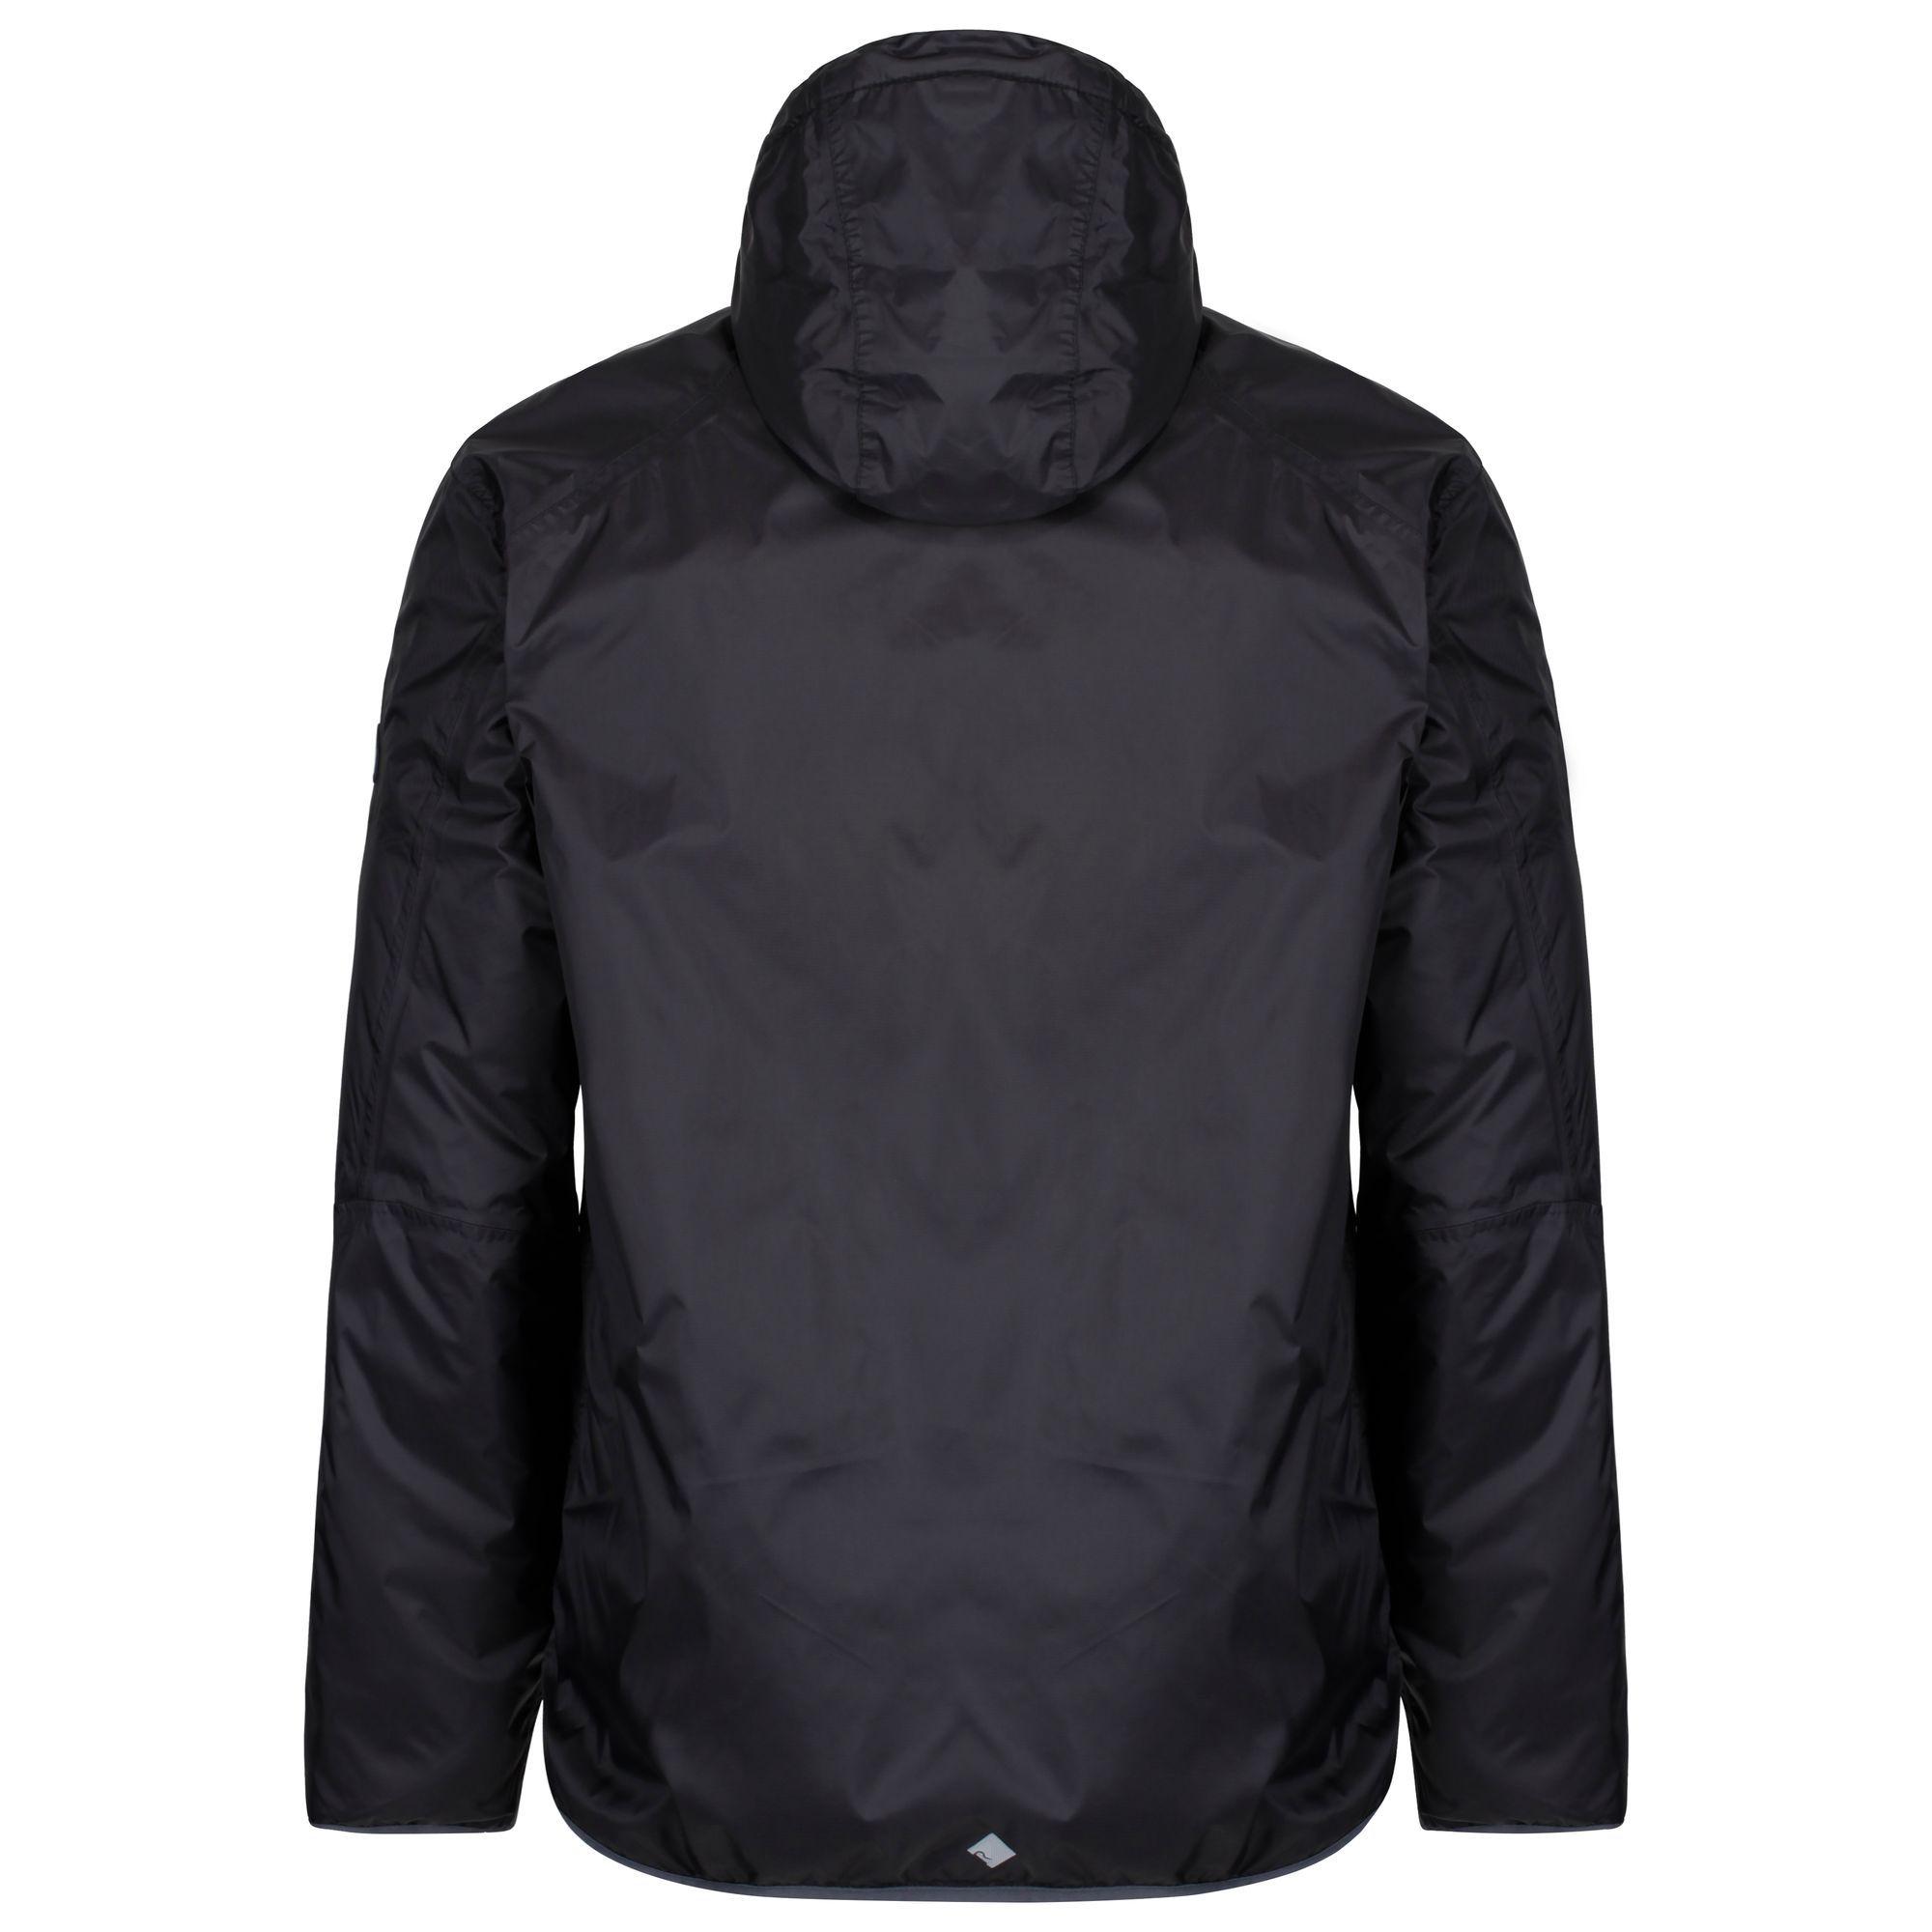 Regatta-Tarren-Mens-Wateproof-Breathable-Fleece-Lined-Jacket-RRP-70 thumbnail 5